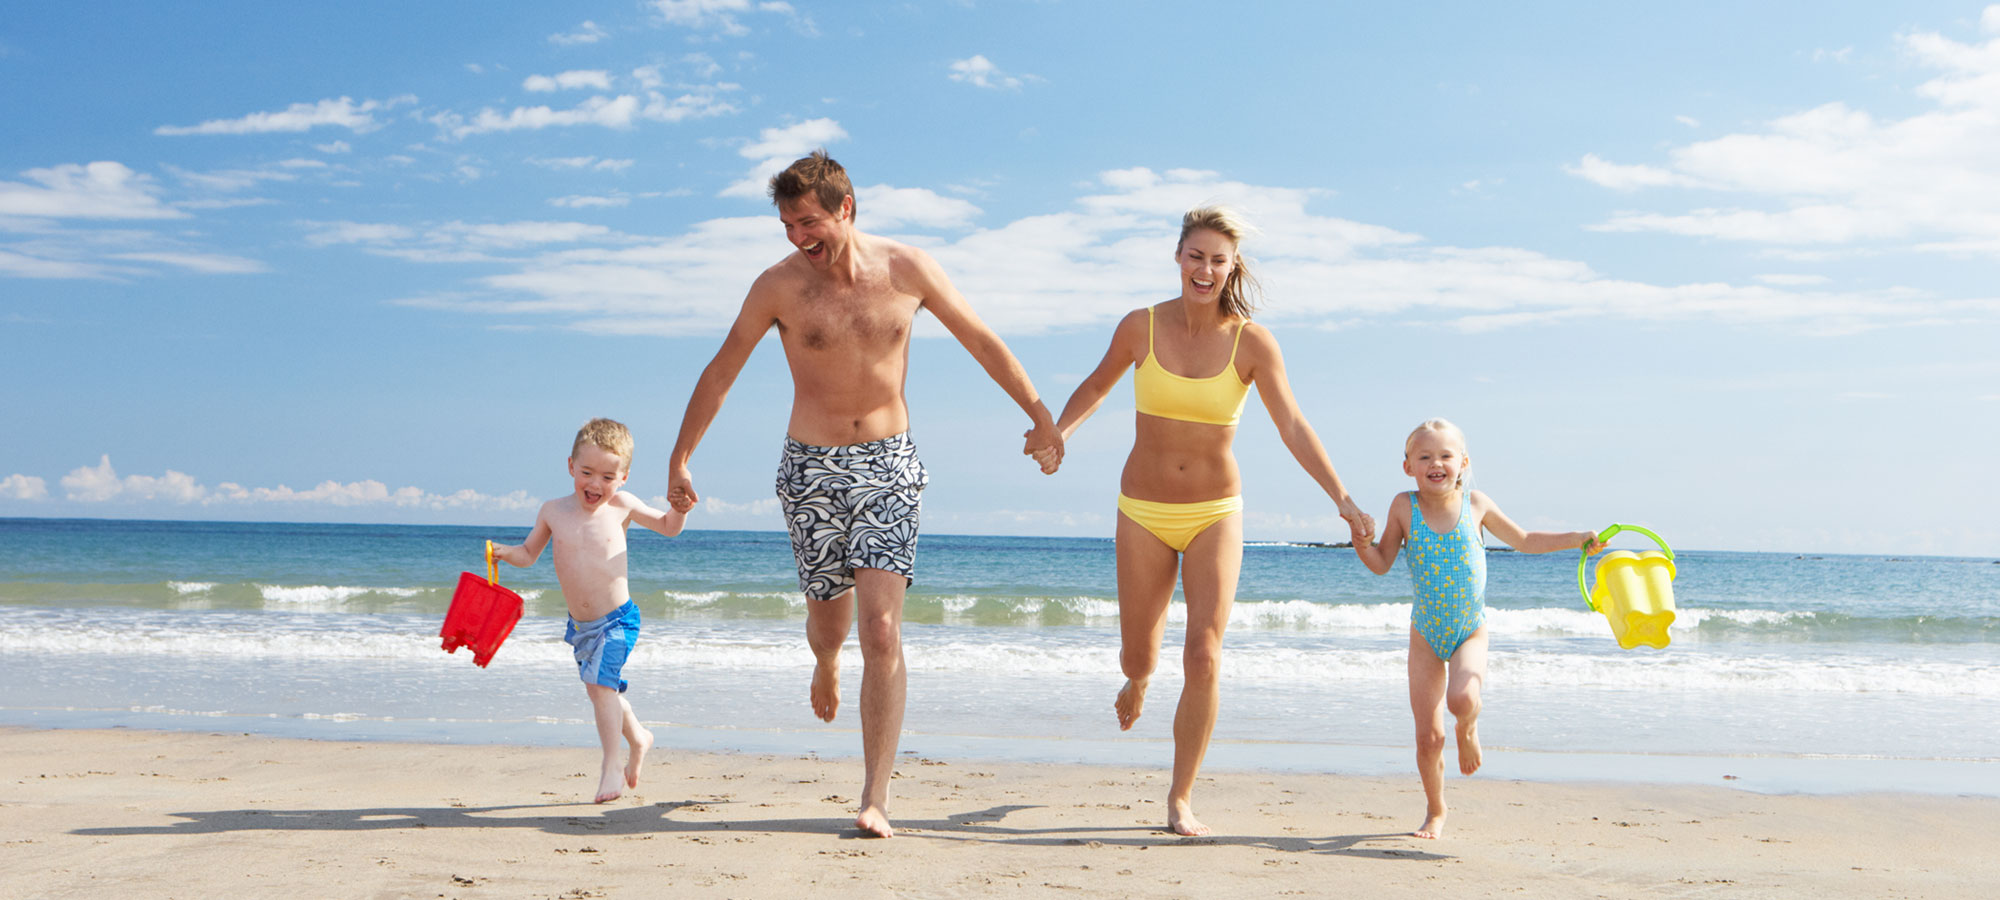 Hotel Bellaria Offerta per Famiglie Settembre